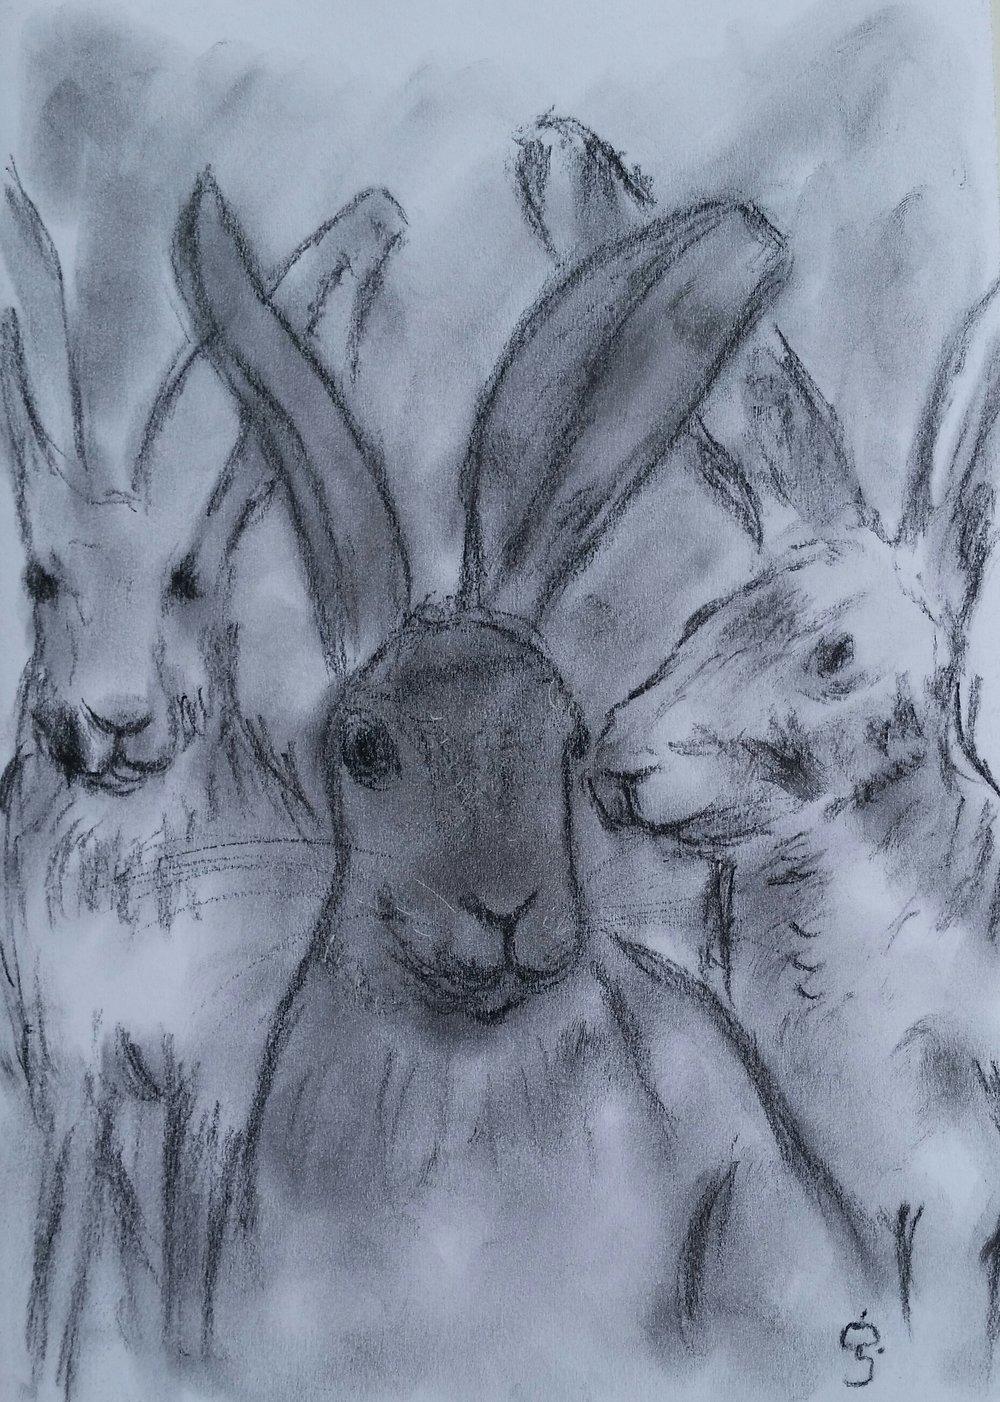 3_hares.jpg-2.jpg